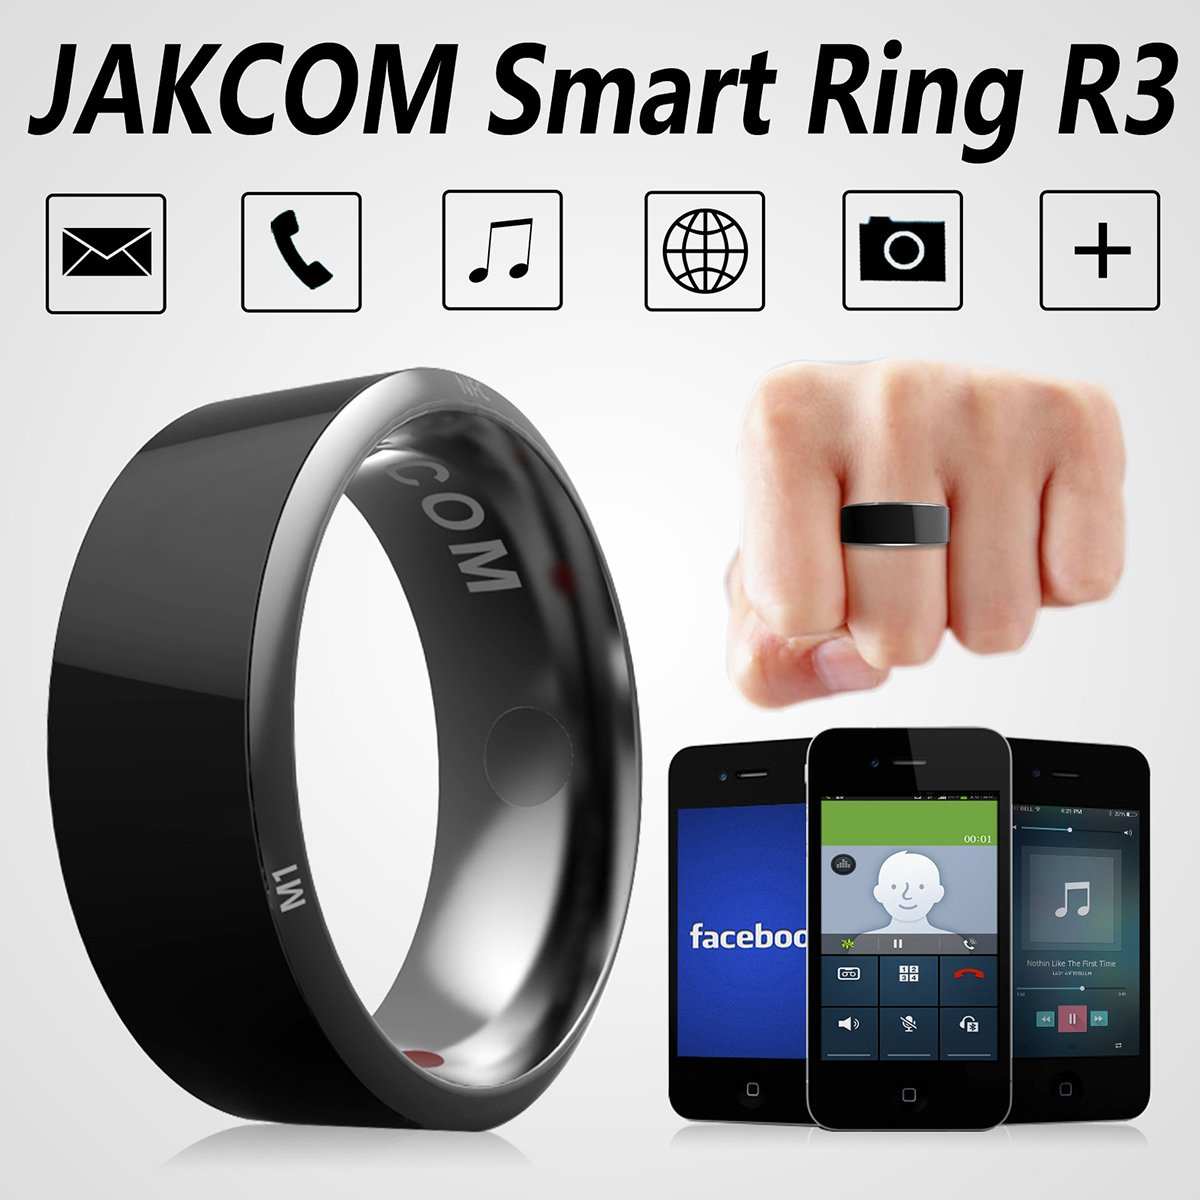 OLSUS Electronic Smart Ring Metal Mini Magic Ring - Black (Size 12)